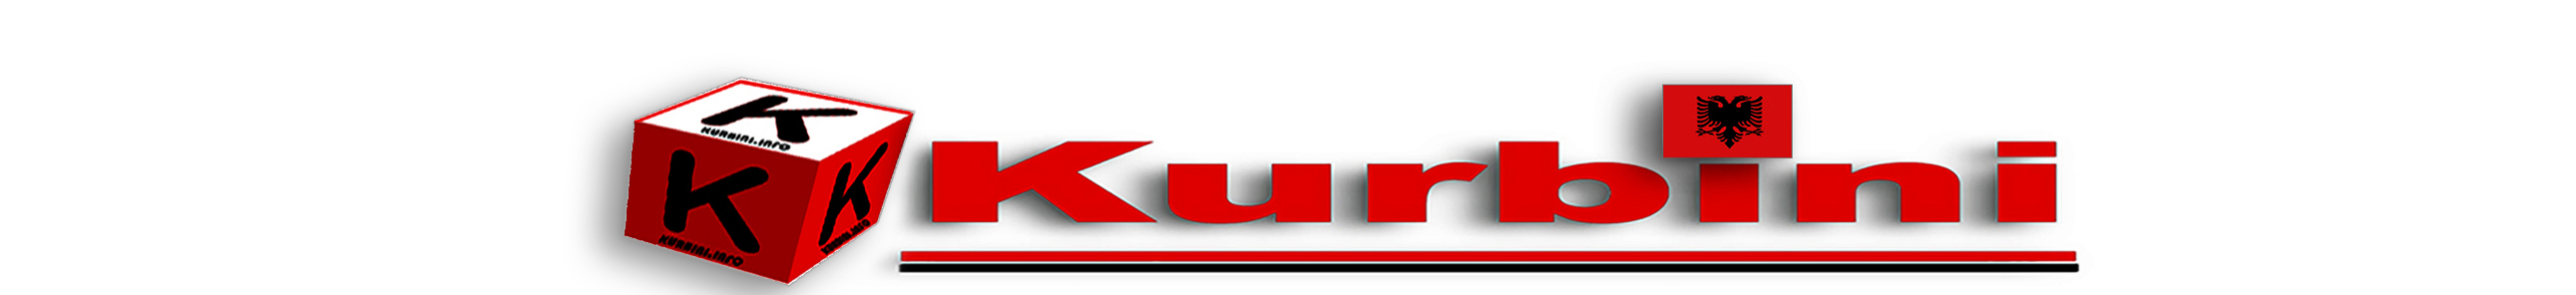 kurbini.info